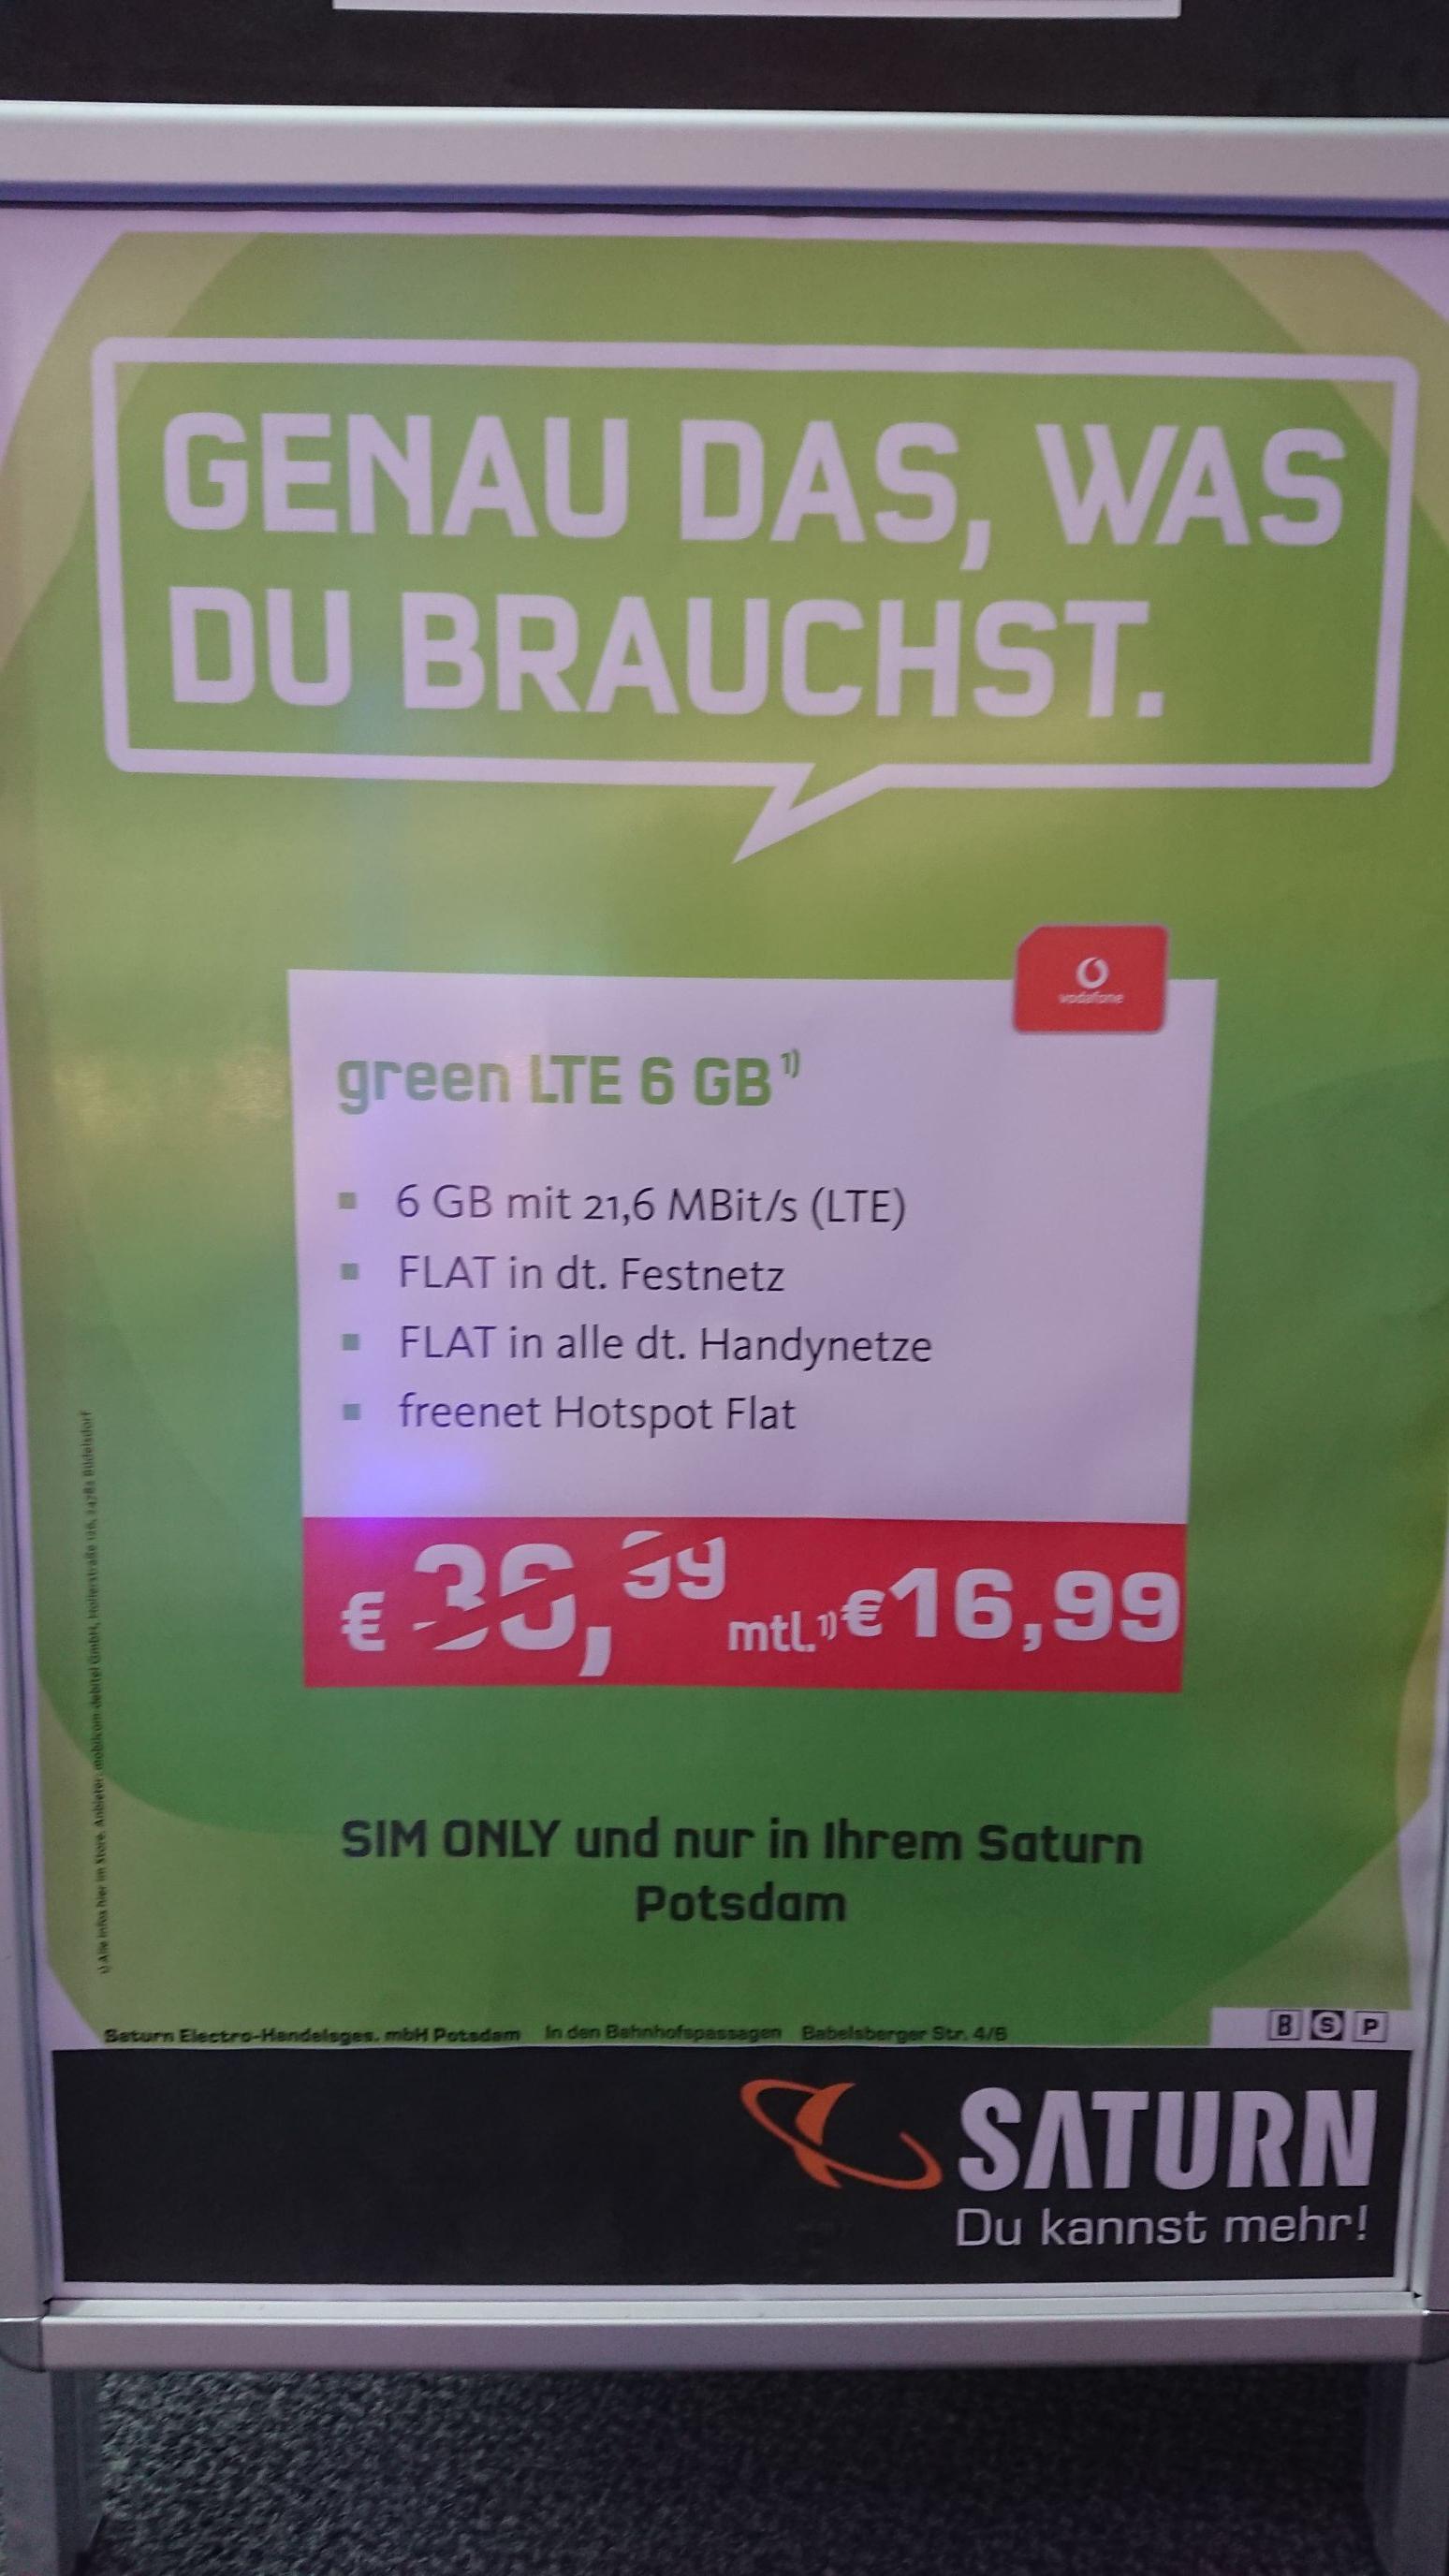 [Lokal Saturn Potsdam] green LTE 6 GB, Sim Only für 16,99 € im Monat